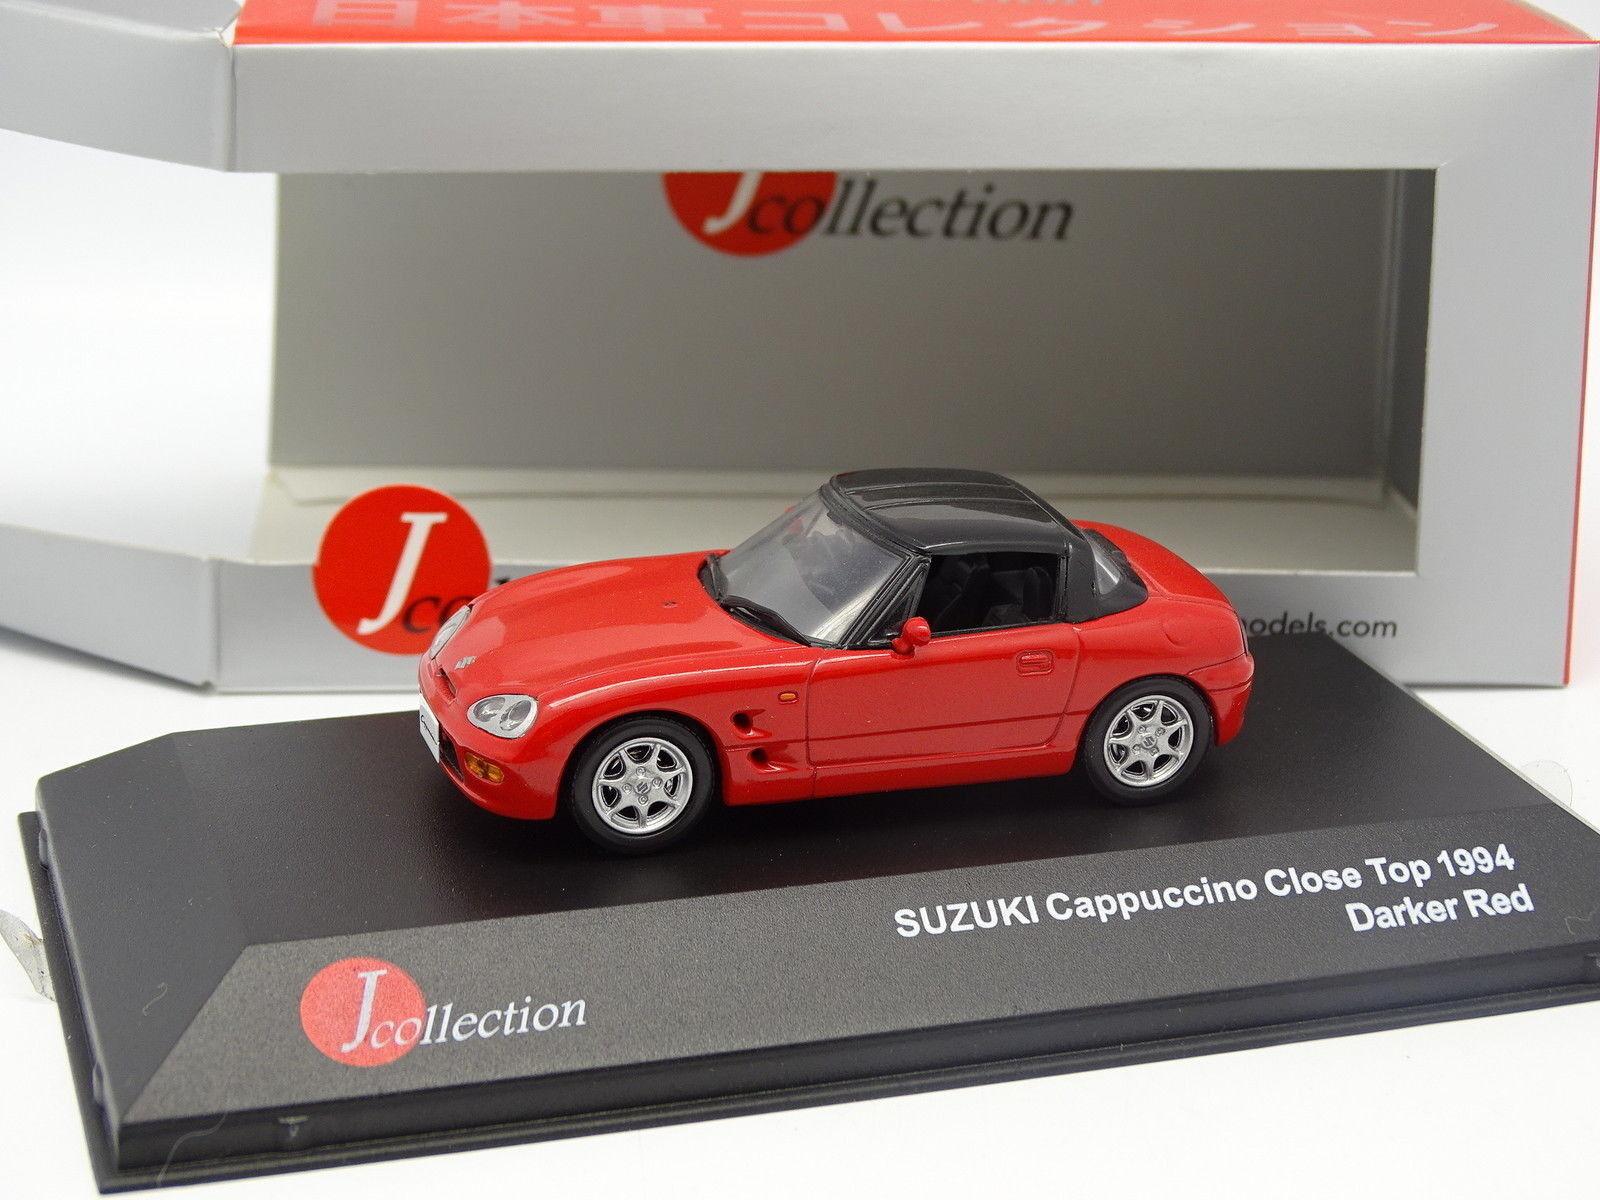 J Collection 1 43 - Suzuki Cappucino Cerrado Top 1994 red